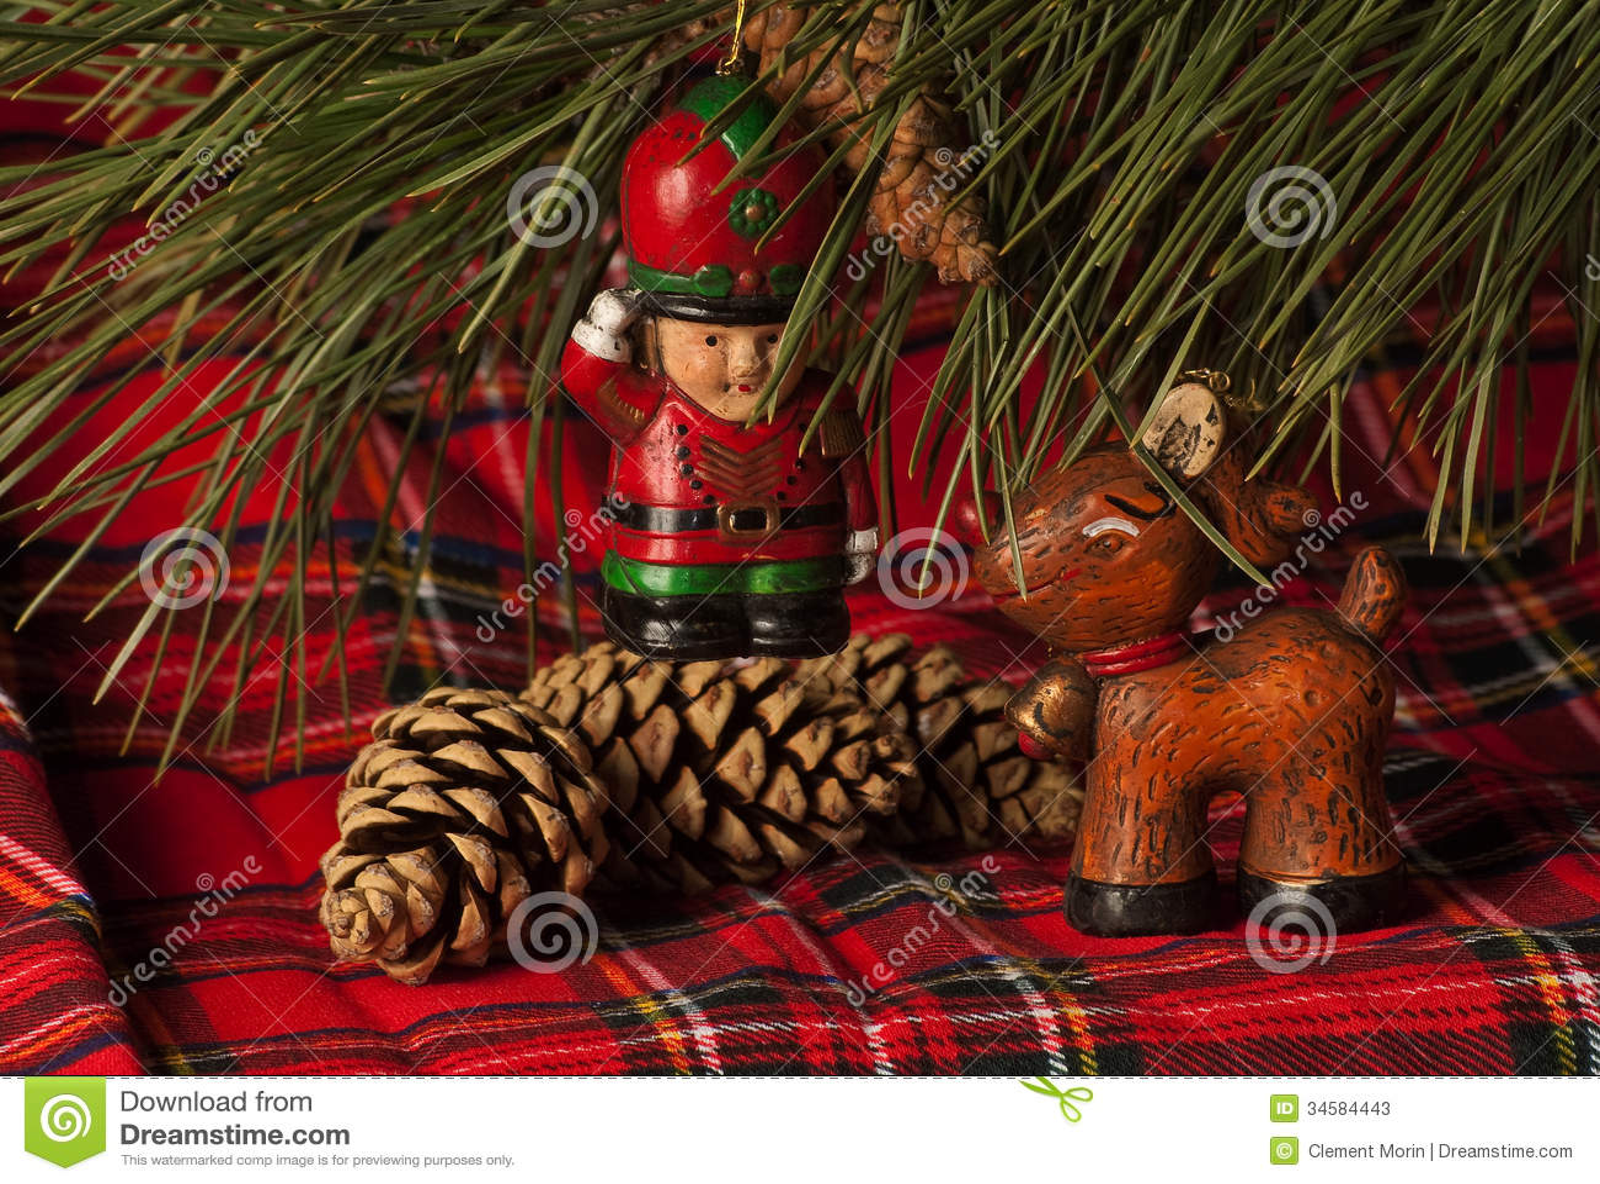 Christmas Decoration Stock Photos - Image: 34584443